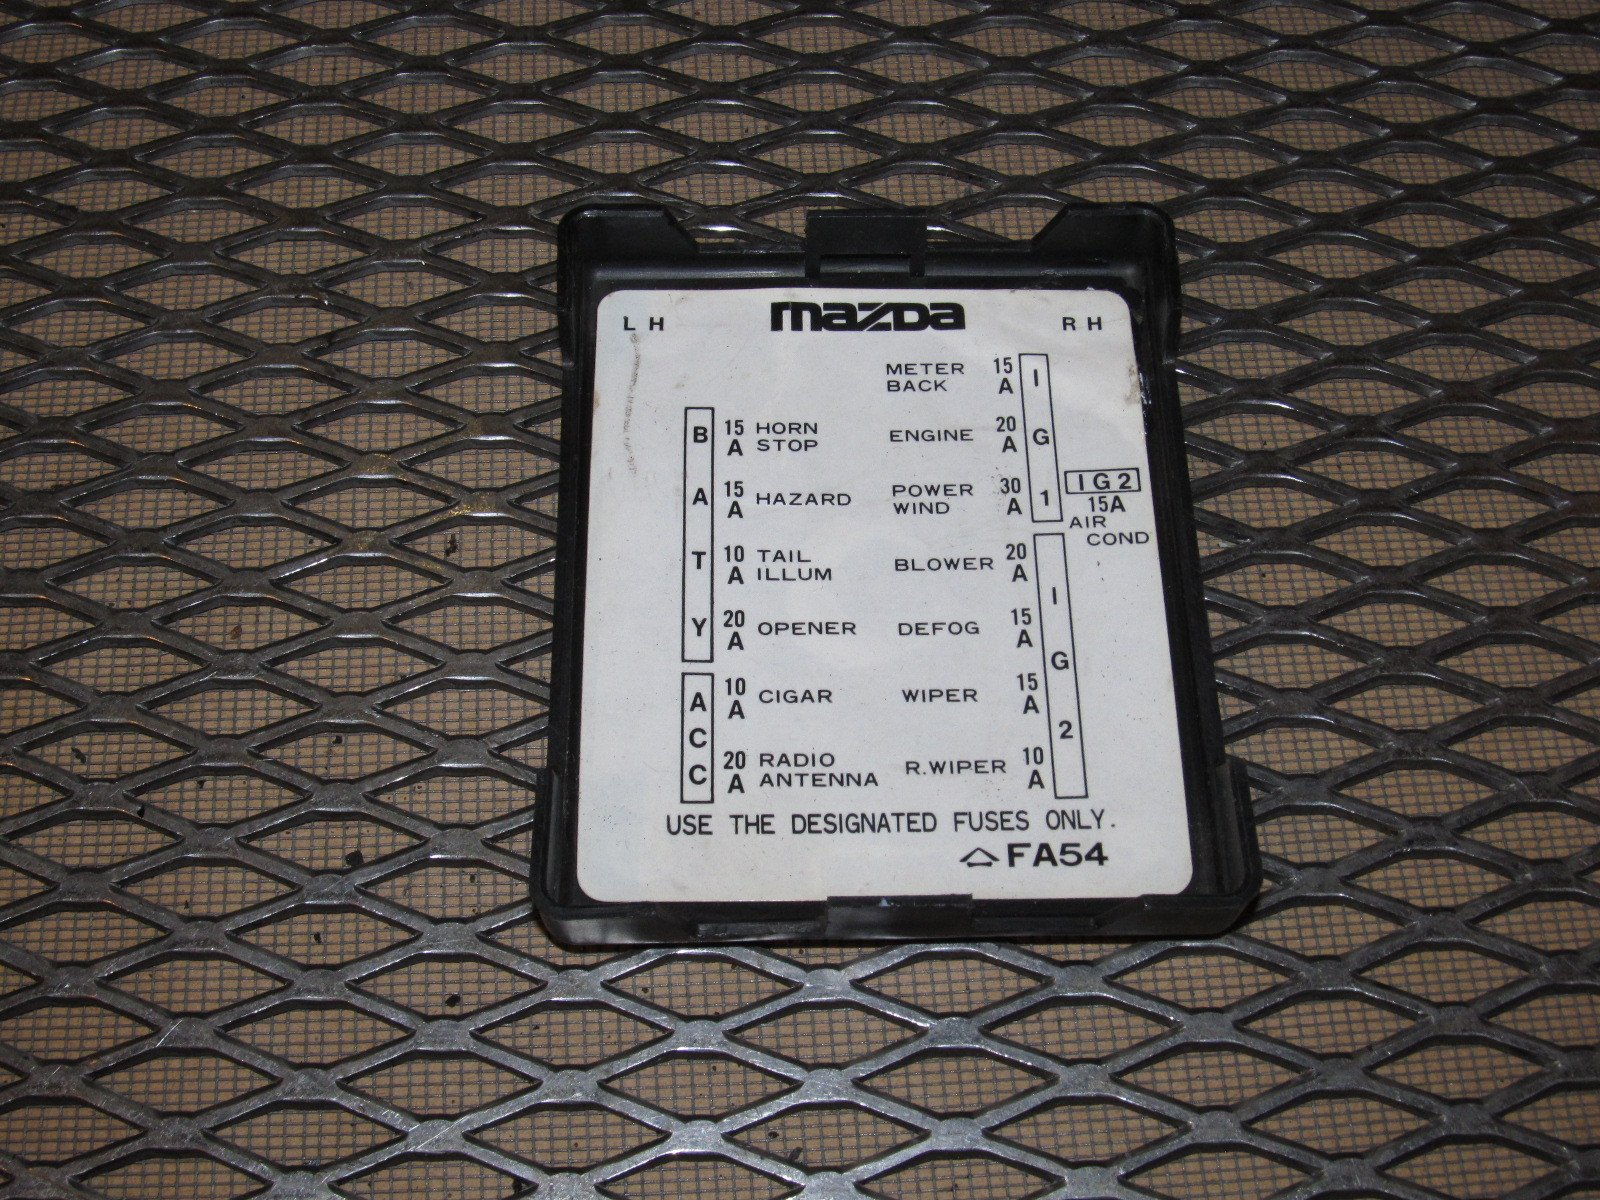 ra_6678] mazda b2200 wiring diagram furthermore mazda rx 7 fuse box diagram  download diagram  phot erek gray benkeme mohammedshrine librar wiring 101